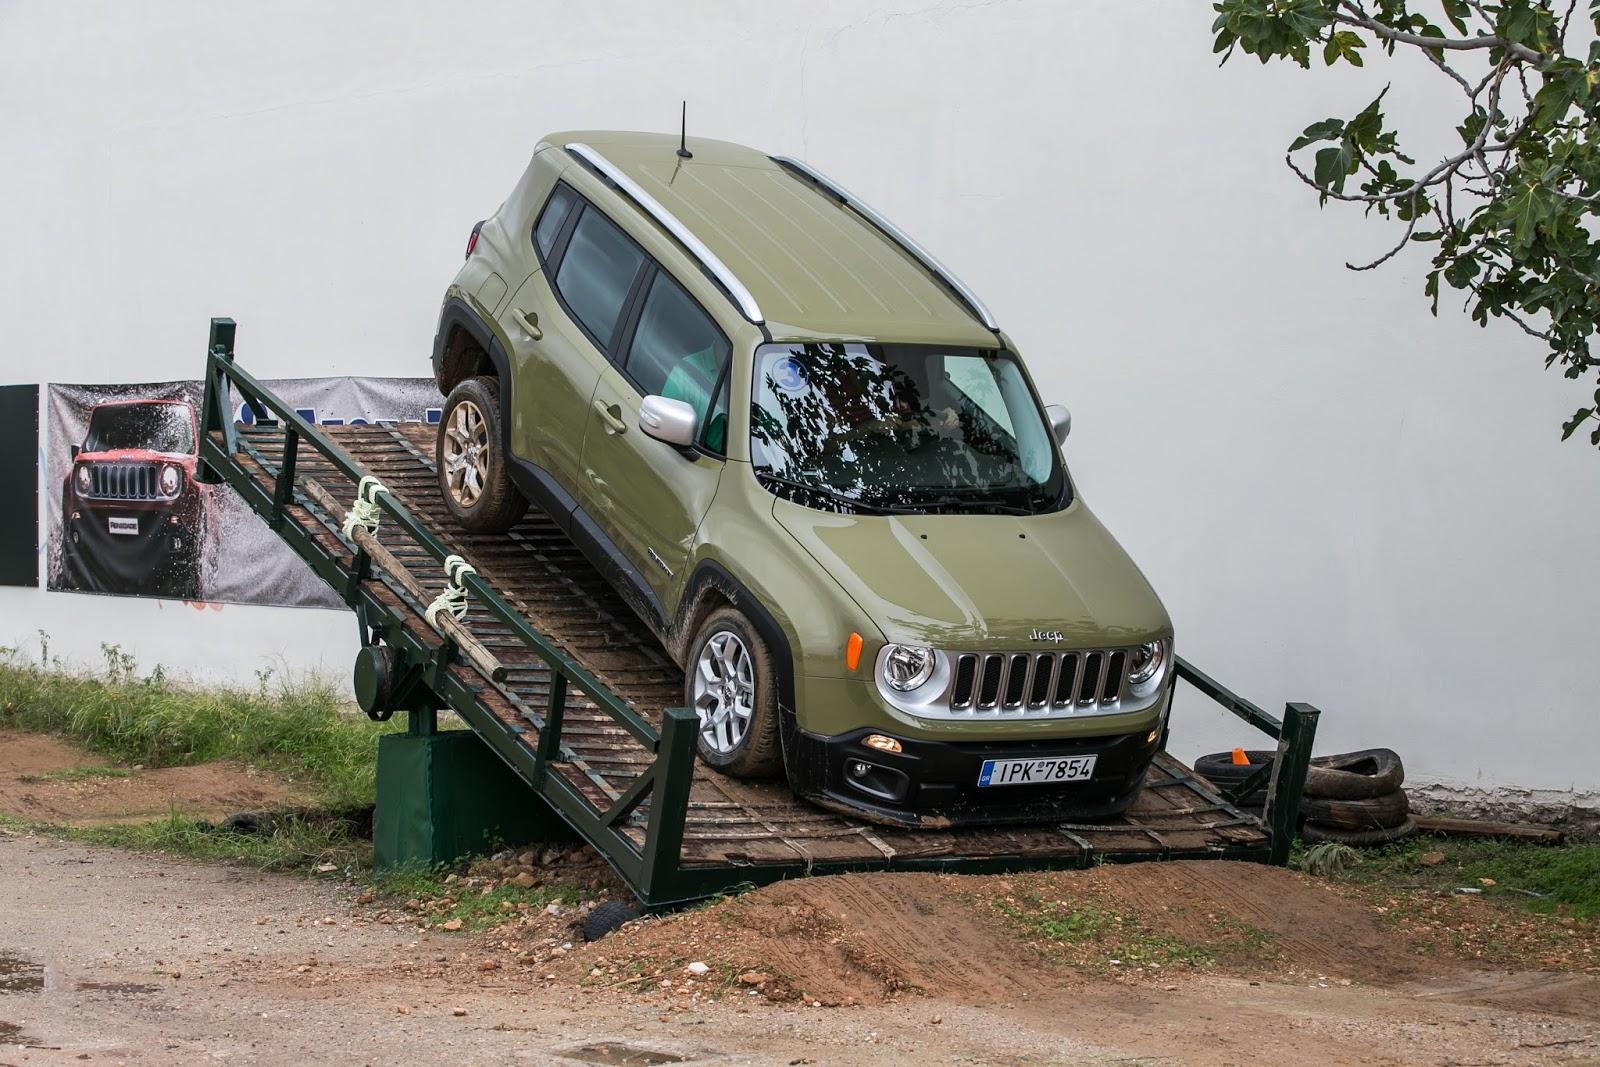 KF 1554 Πετάμε ένα Jeep Renegade σε λάσπες, πέτρες, άμμο, λίμνες. Θα τα καταφέρει; Jeep, Jeep Renegade, Renegade, SUV, TEST, zblog, ΔΟΚΙΜΕΣ